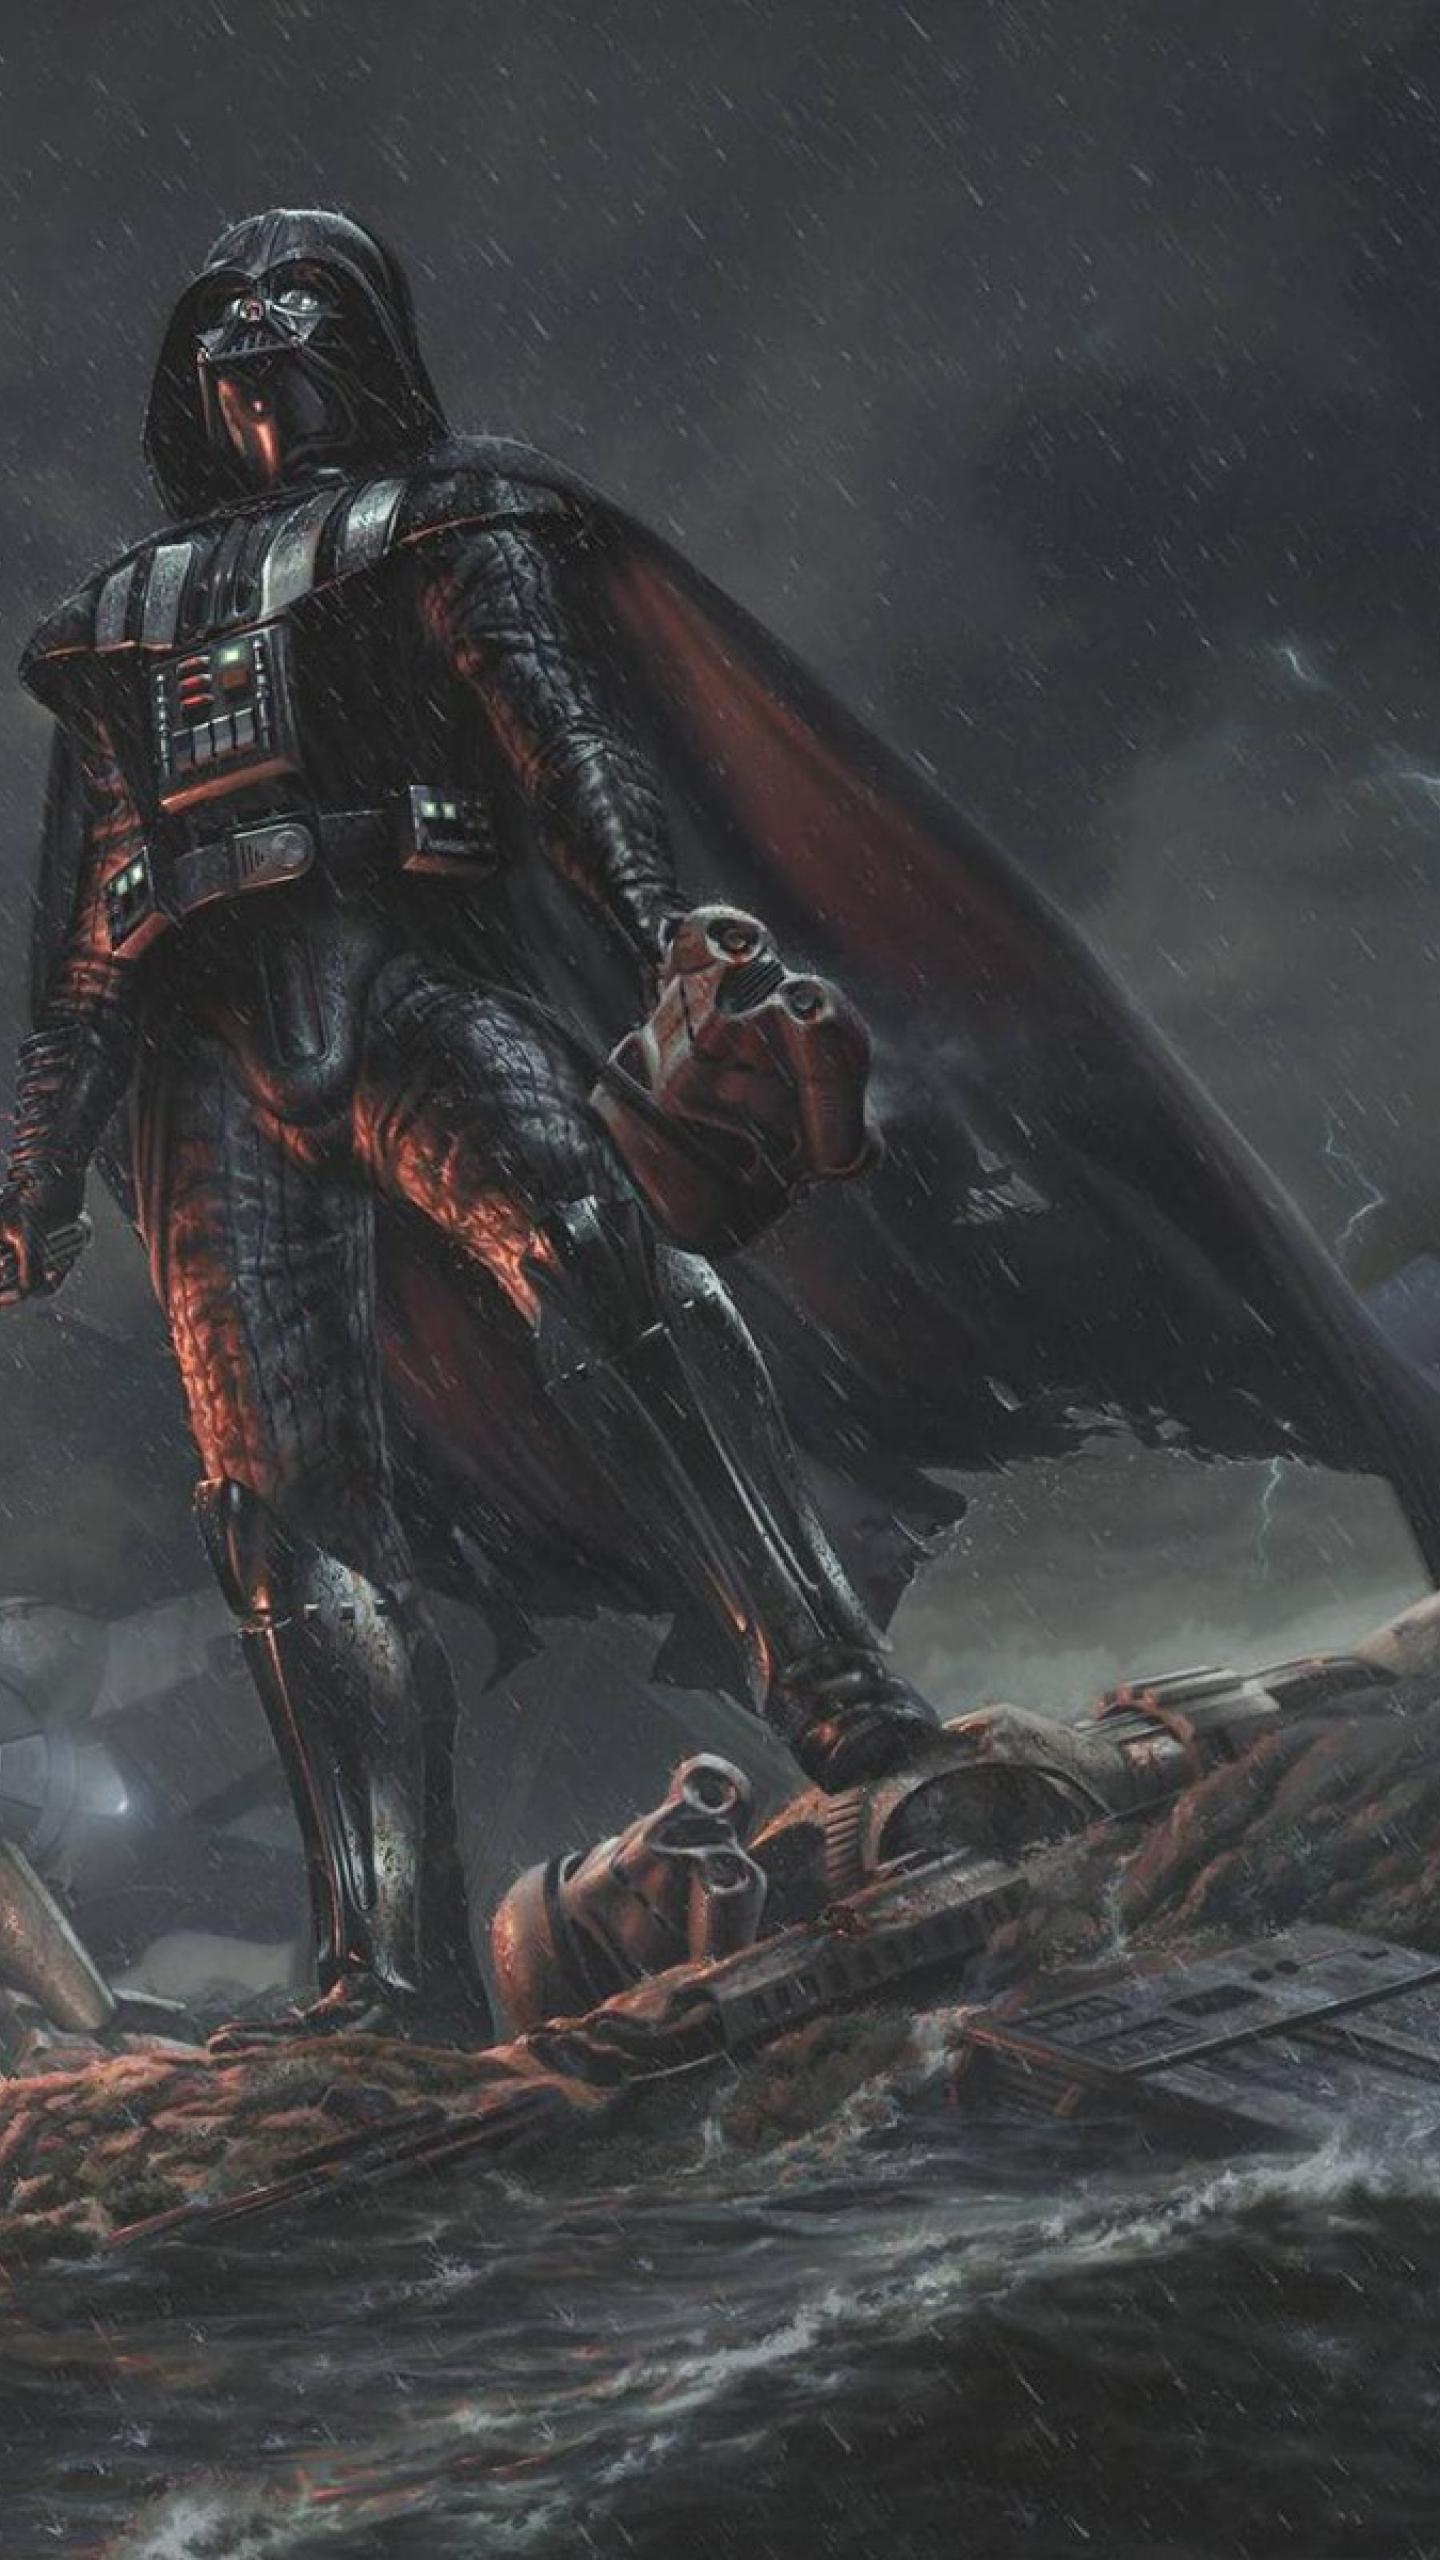 download darth vader star wars stormtrooper 1440x2560 resolution